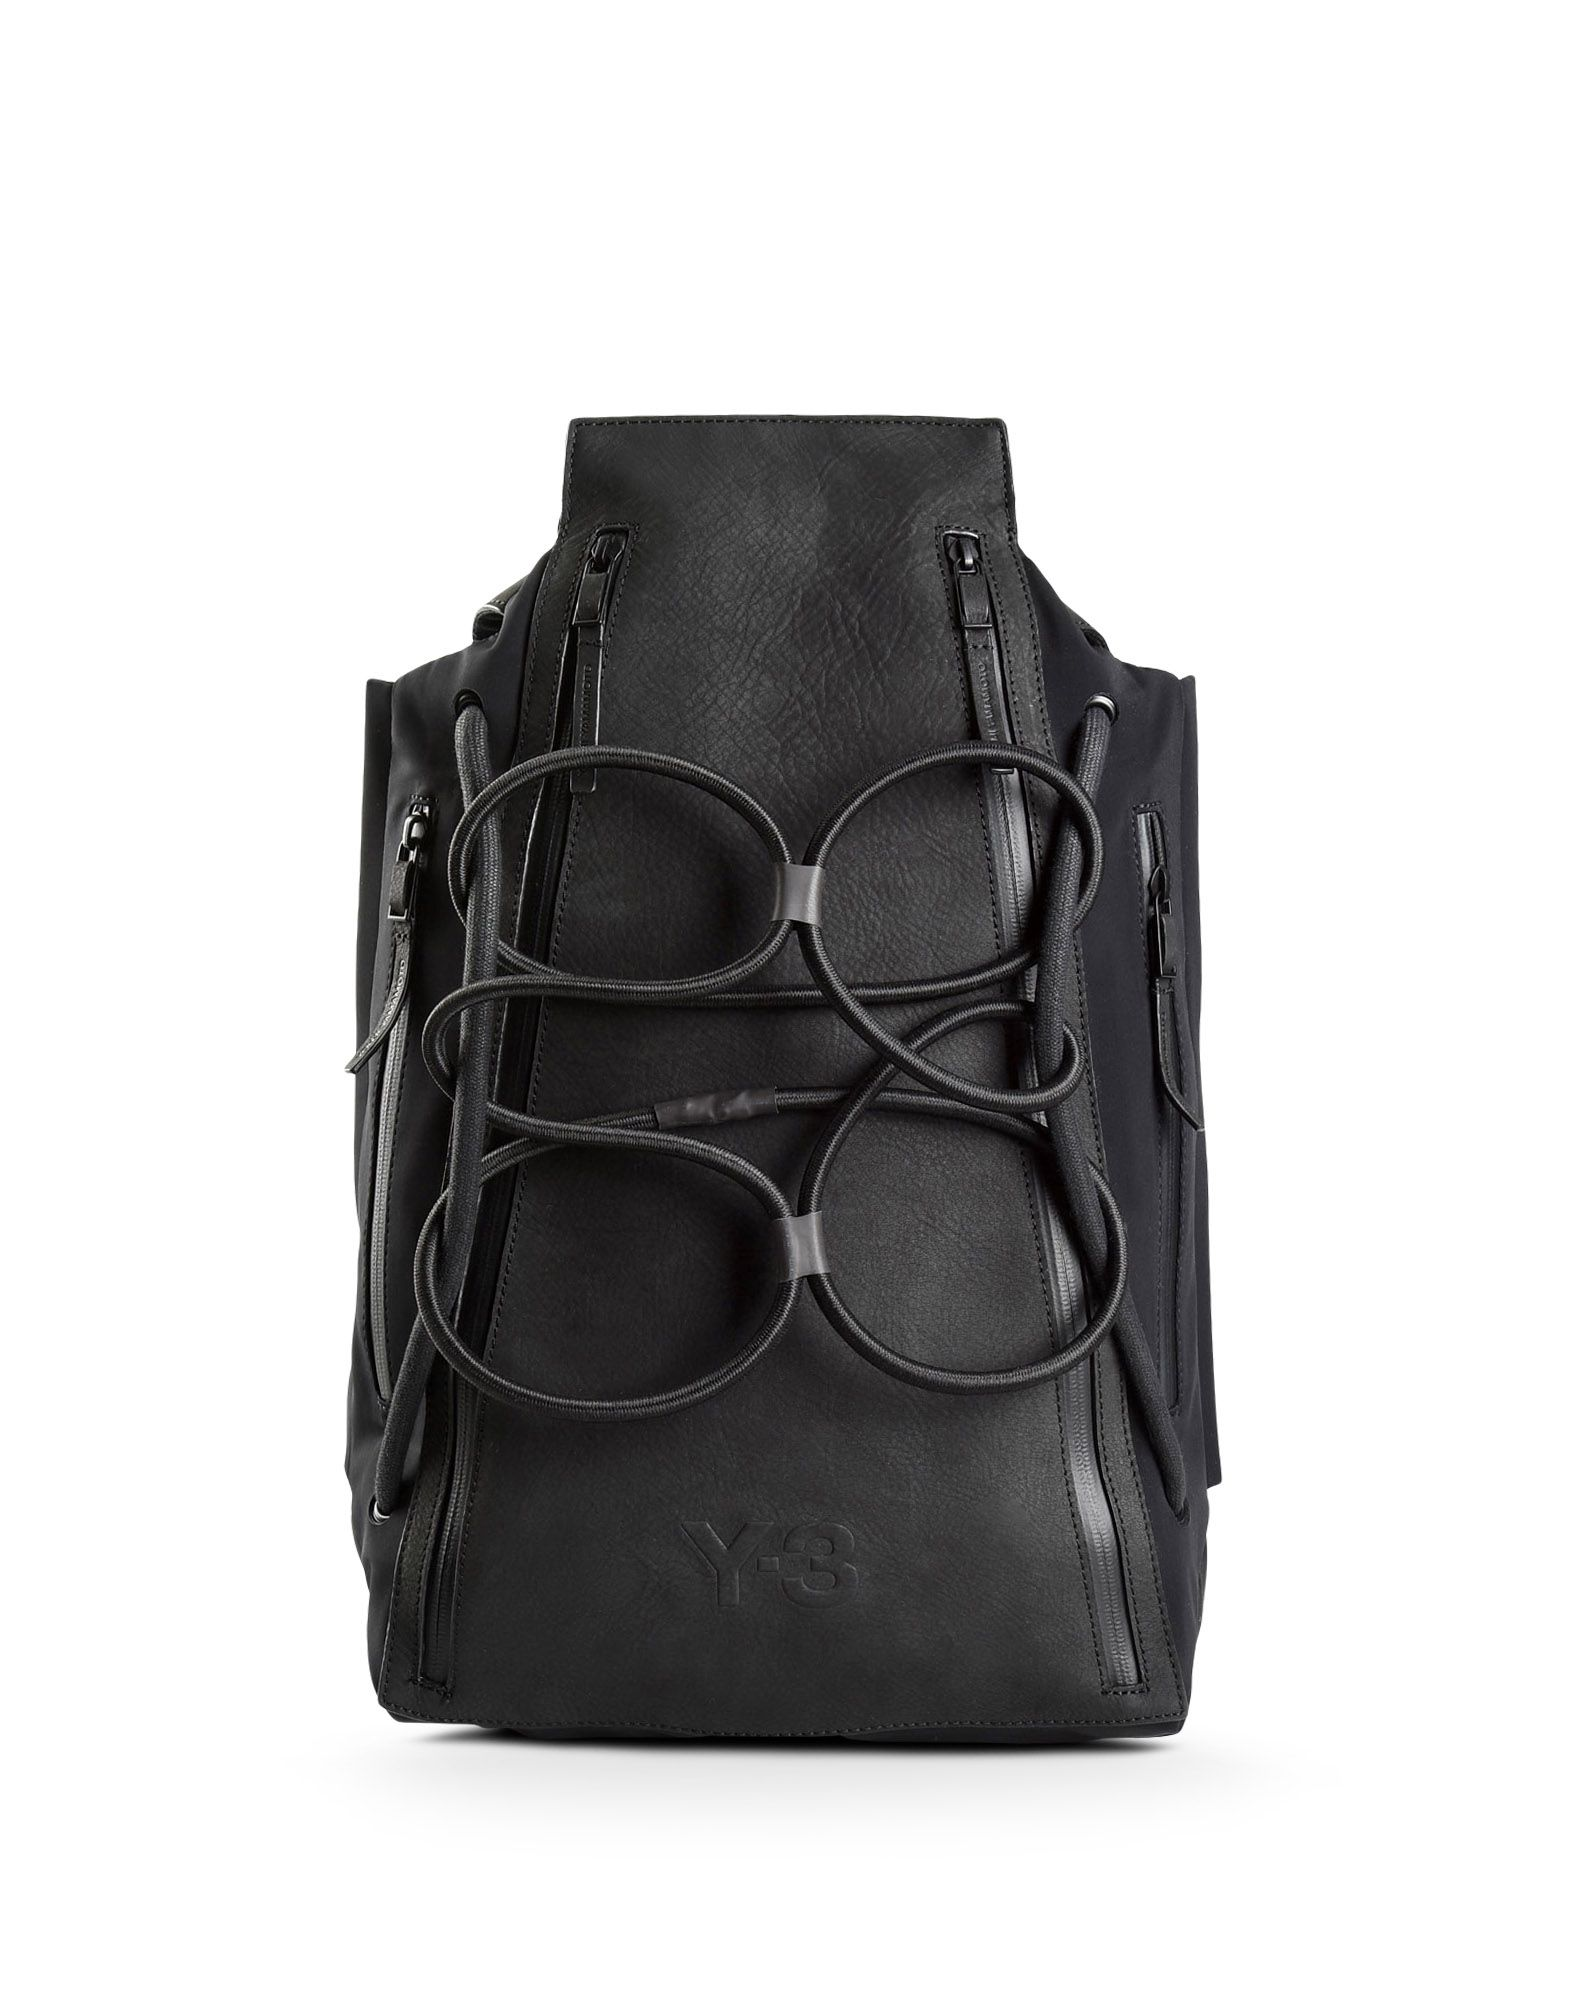 Y-3 HIGHLIGHT BACKPACK BAGS unisex Y-3 adidas